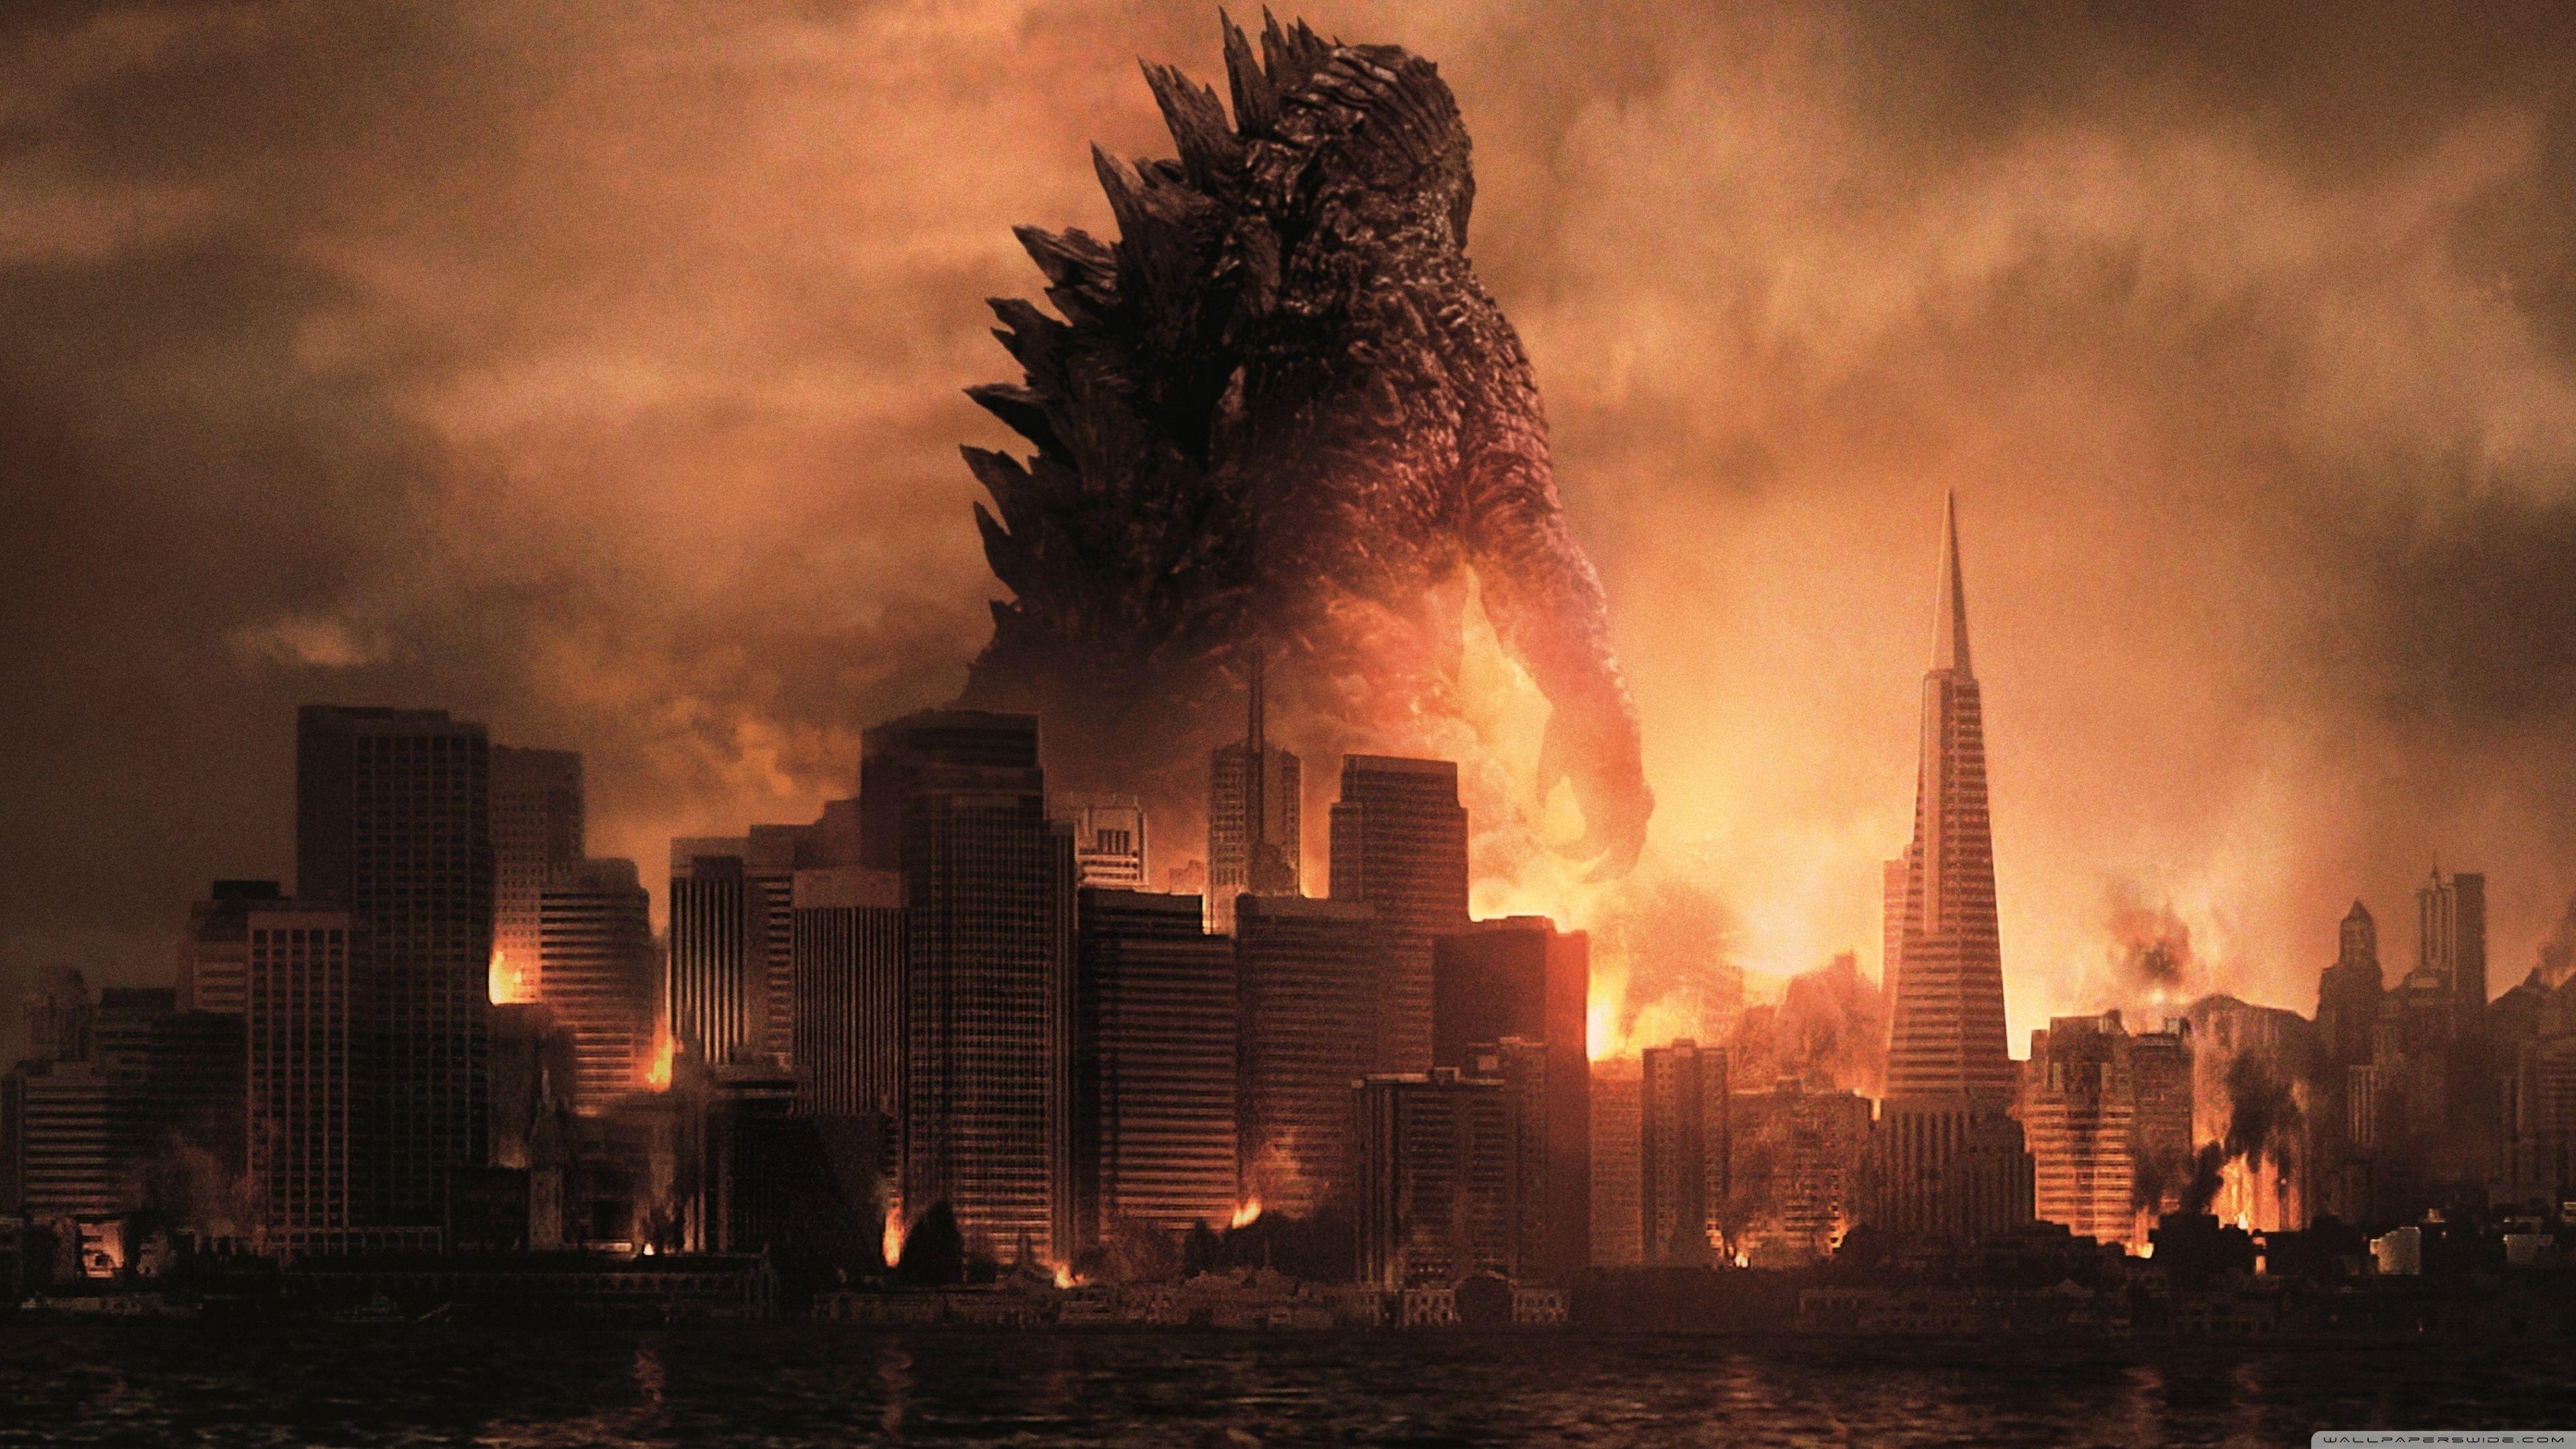 Godzilla Wallpaper Images 82 Images